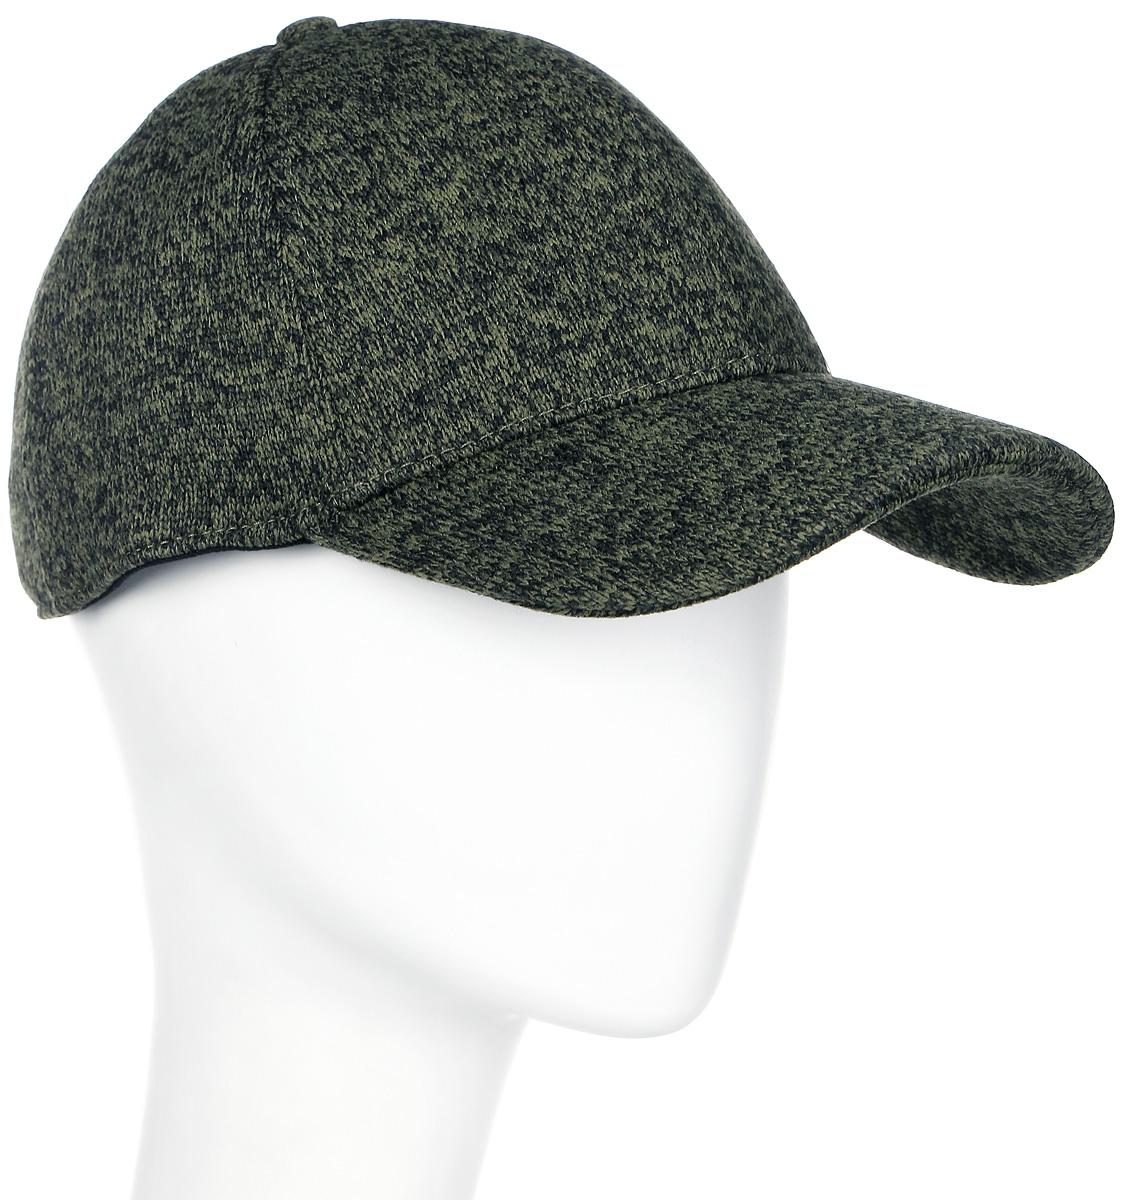 Бейсболка мужская Icepeak, цвет: зеленый. 858827872IV-572. Размер универсальный858827872IV-572